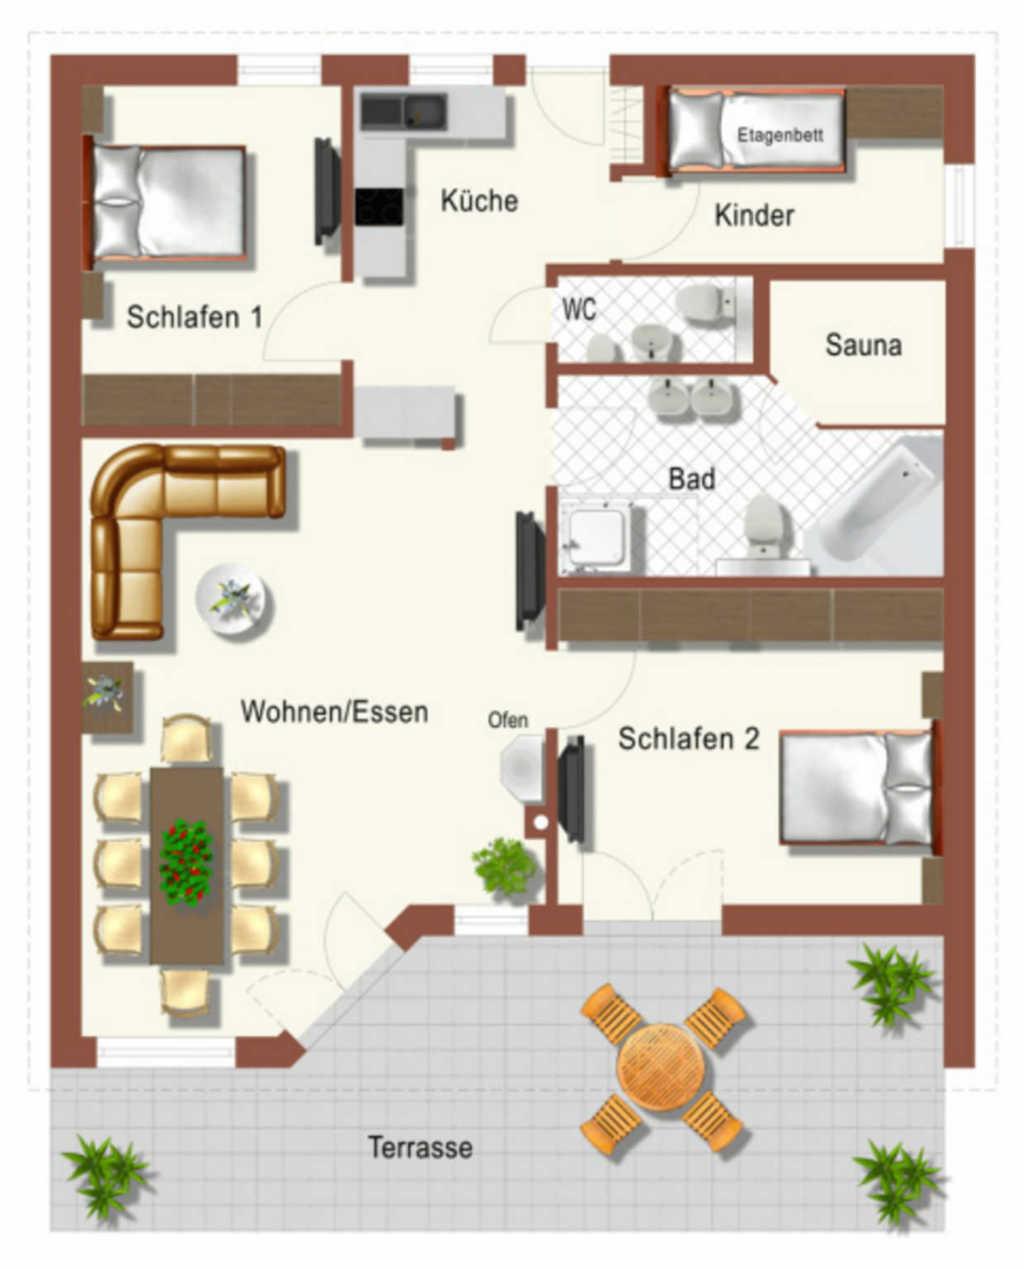 BUE - Ferienhaus in Büsum, Deik 4-Raum Terr. Spülm